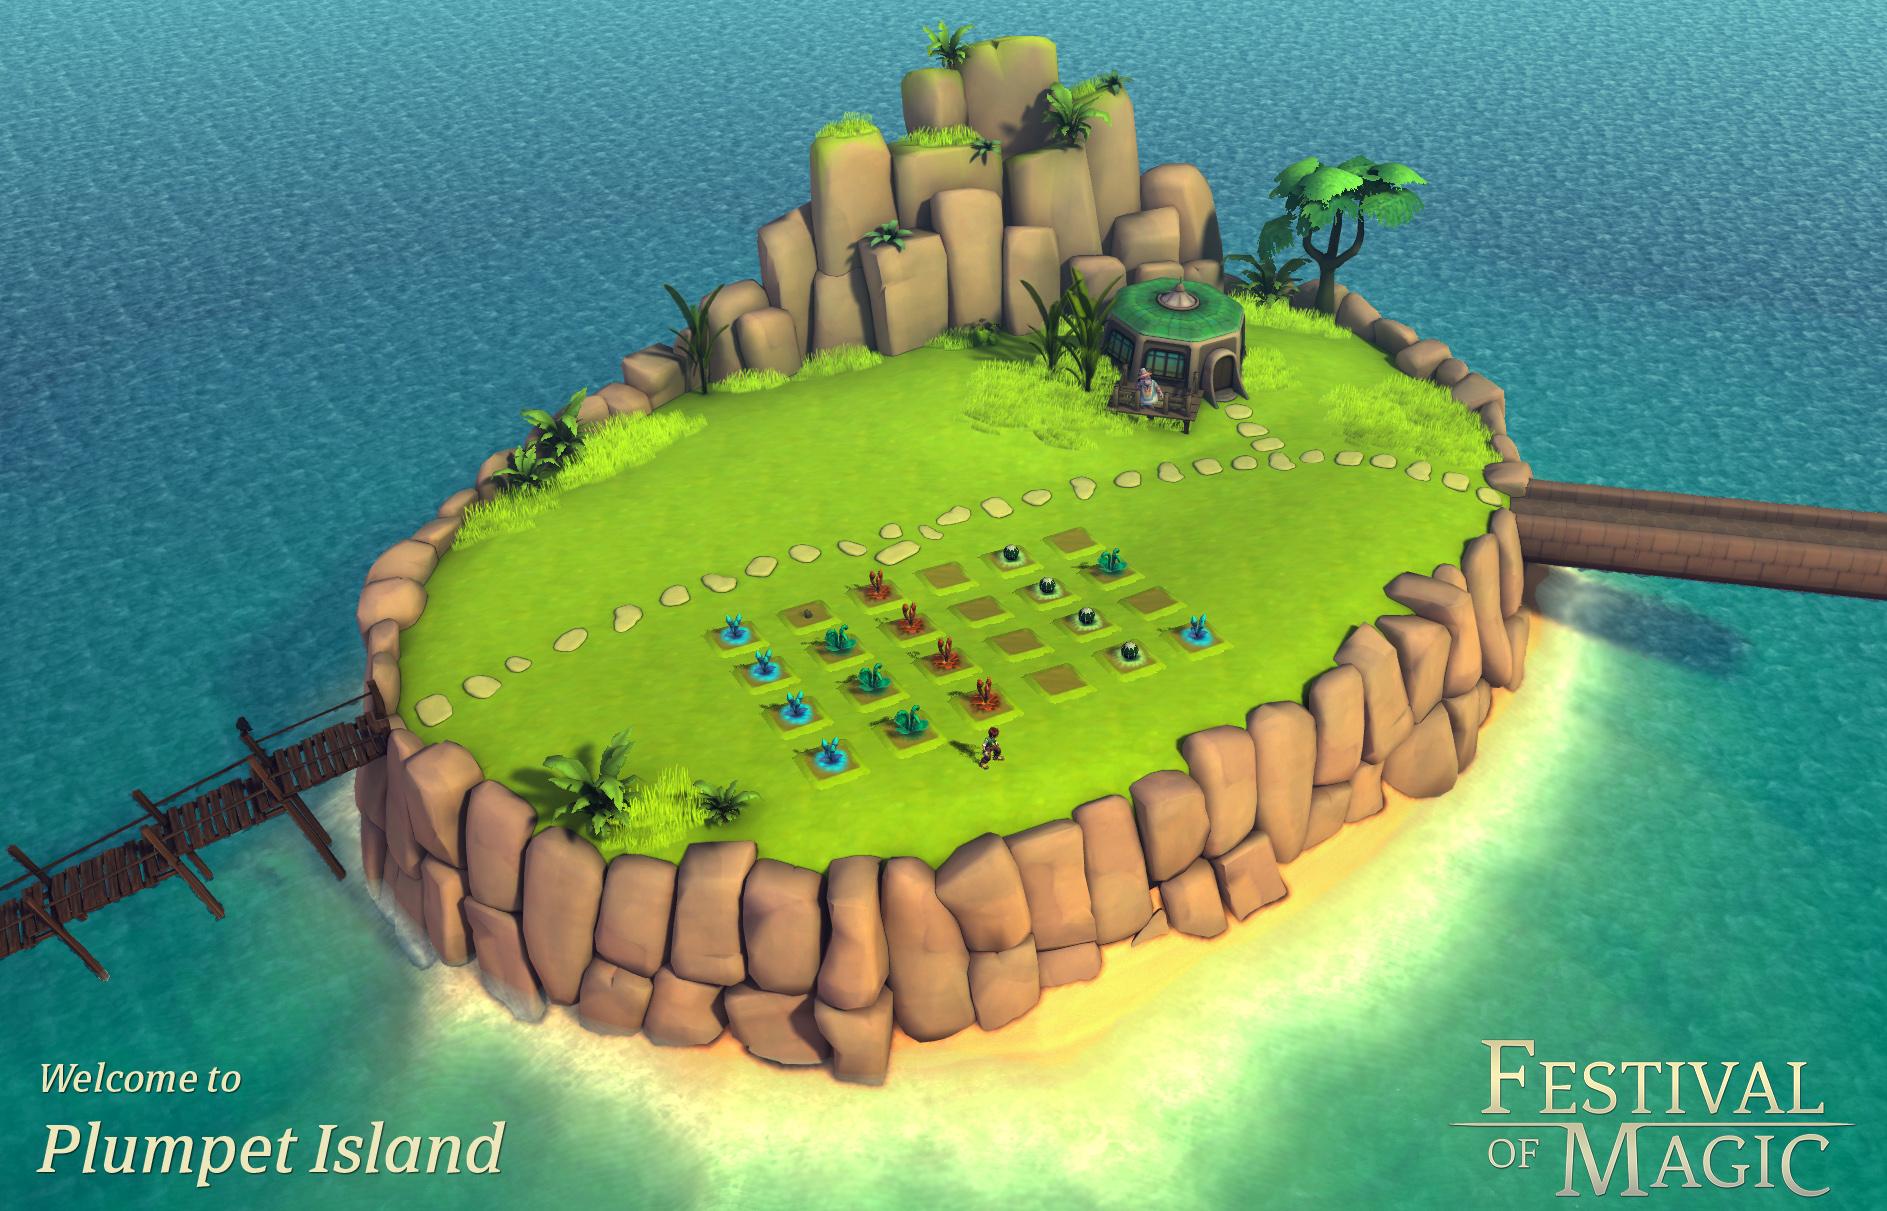 Plumpet Island (Festival of Magic)